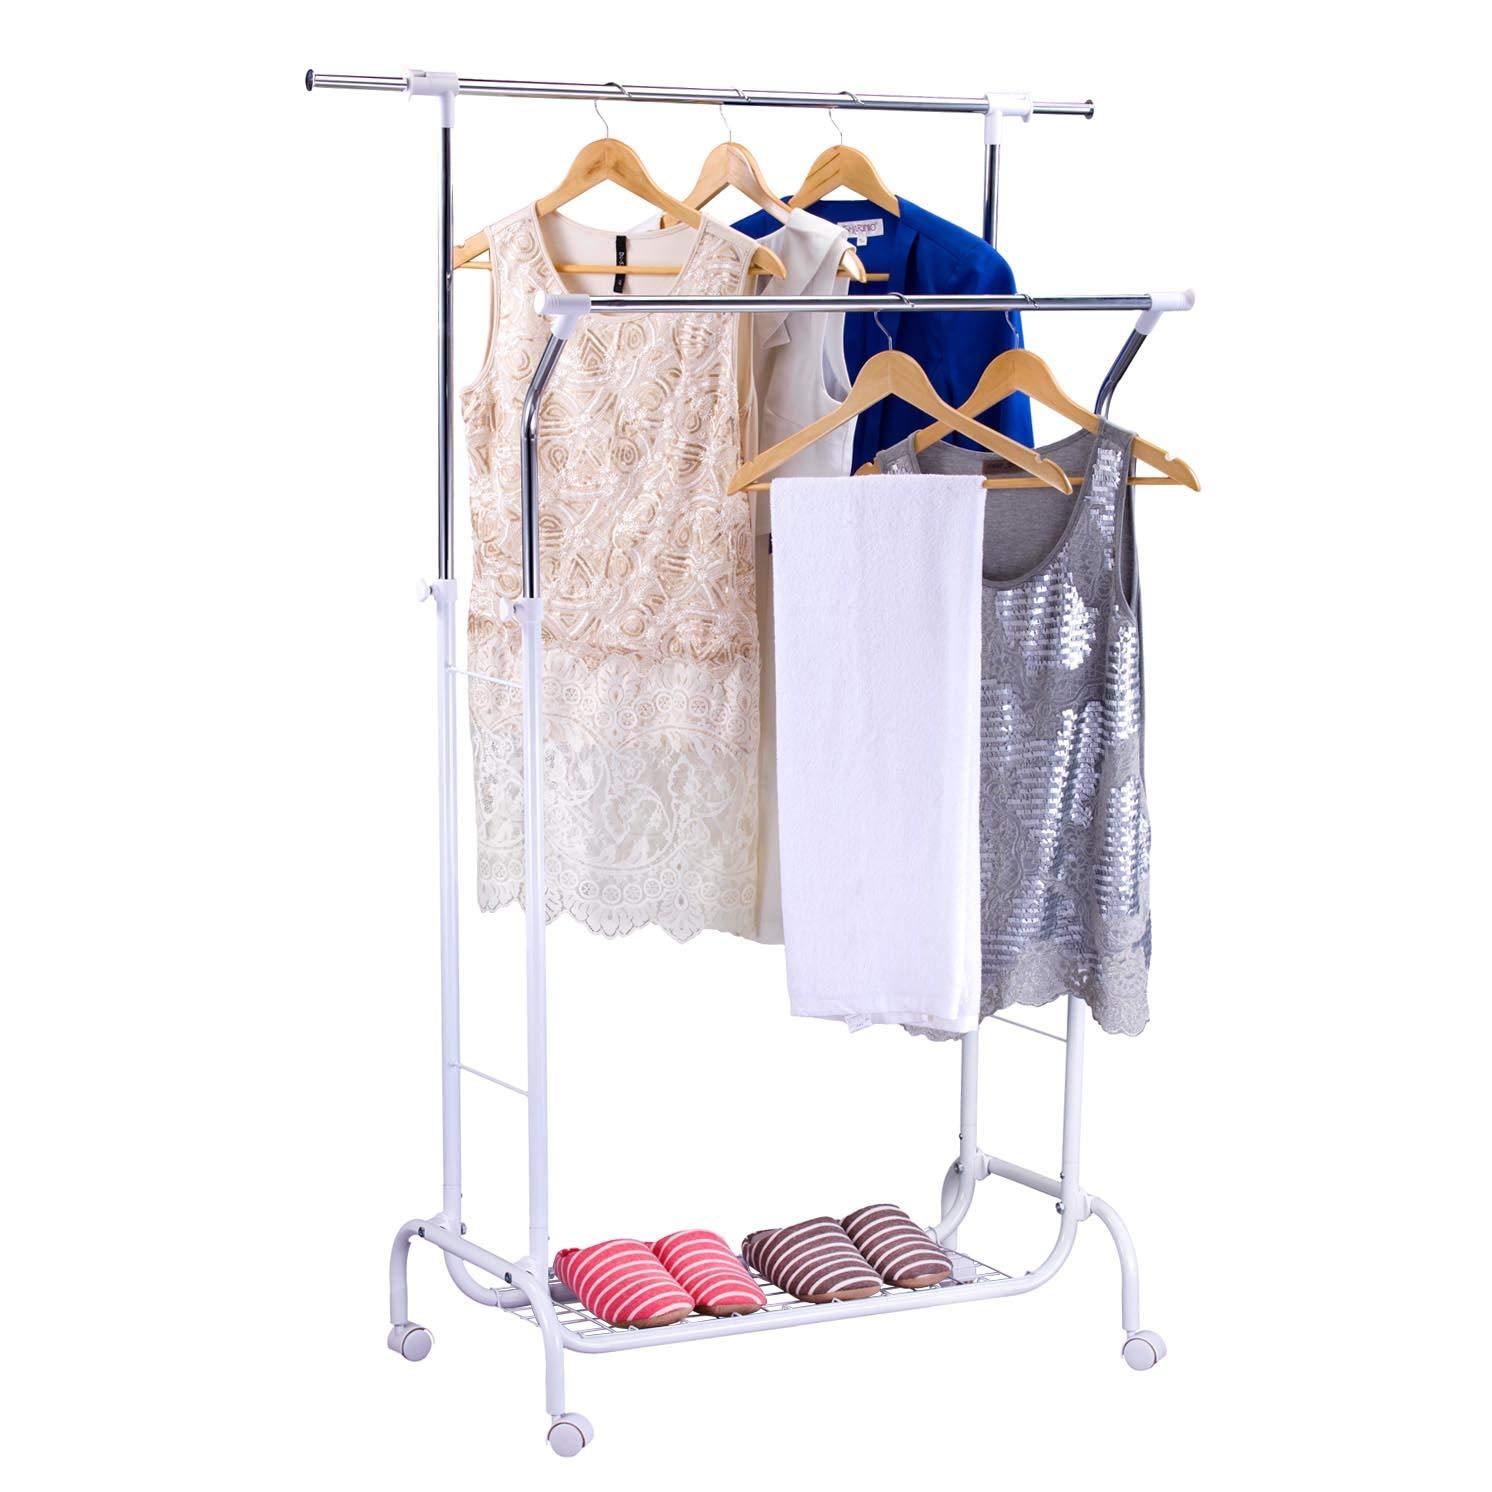 Amazoncom Mythinglogic Double Rail Garment Rack With Wheels Heavy Duty